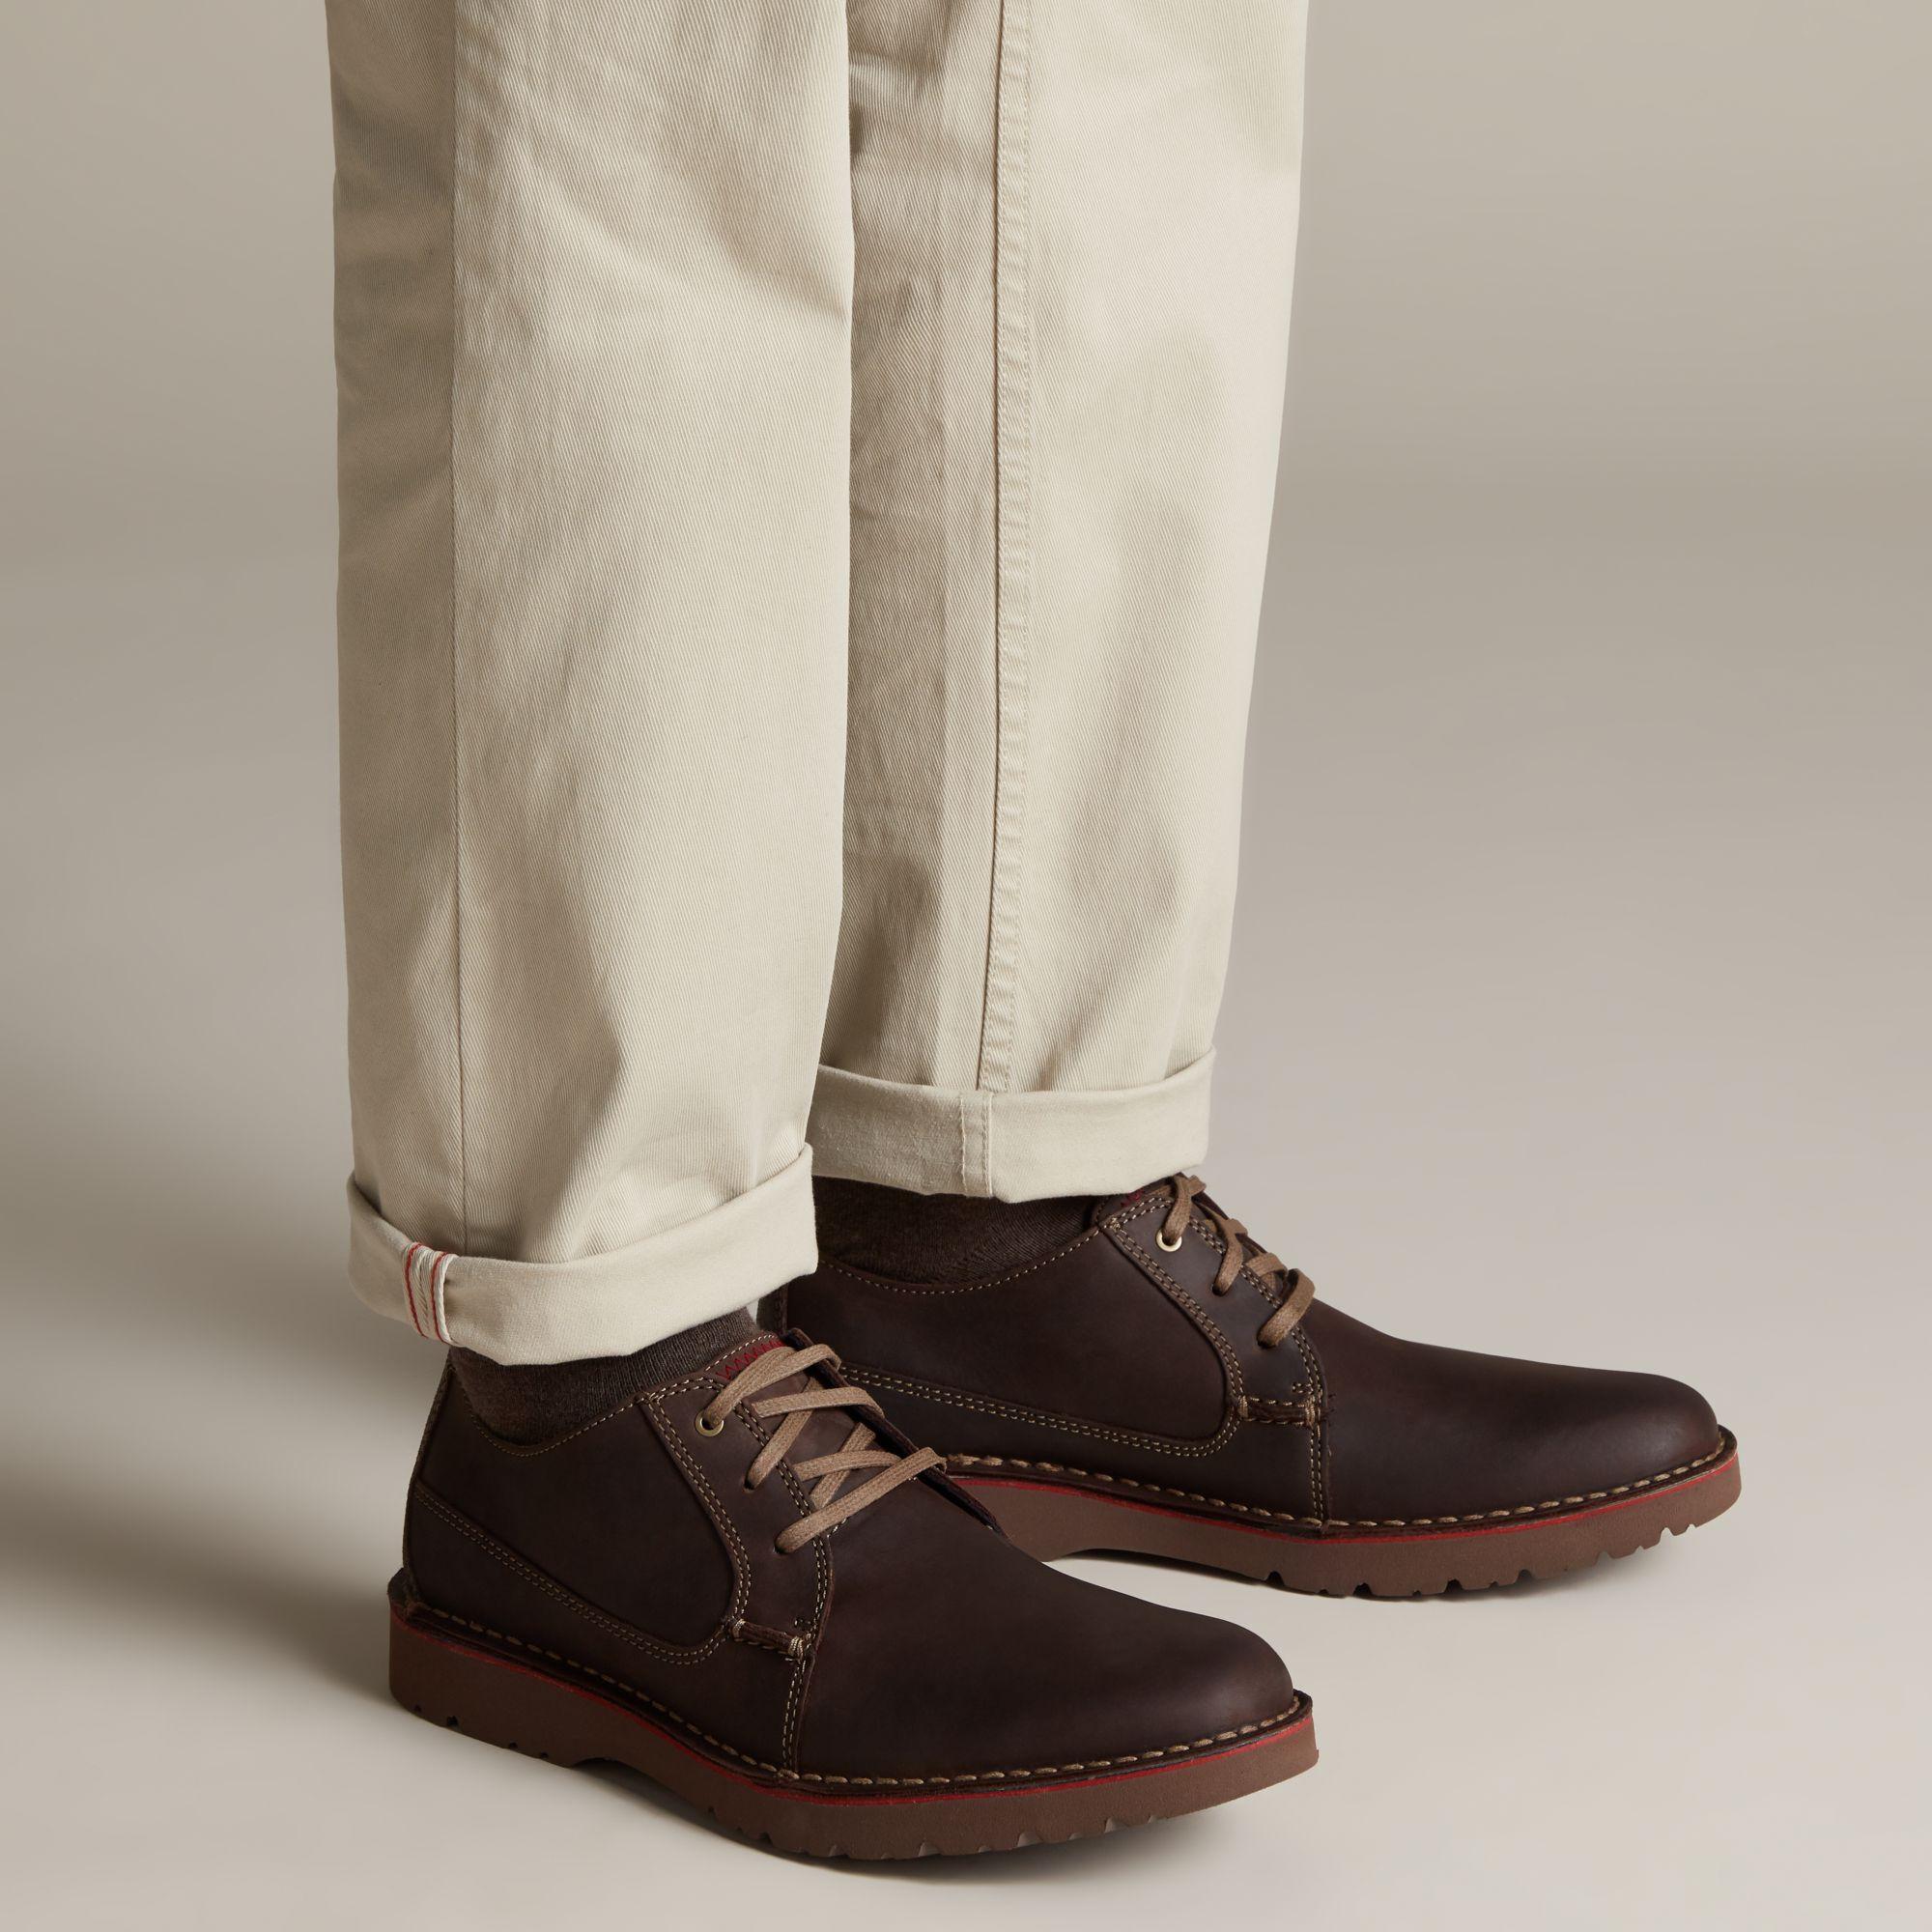 Men's Dark Brown Leather Shoes - Vargo